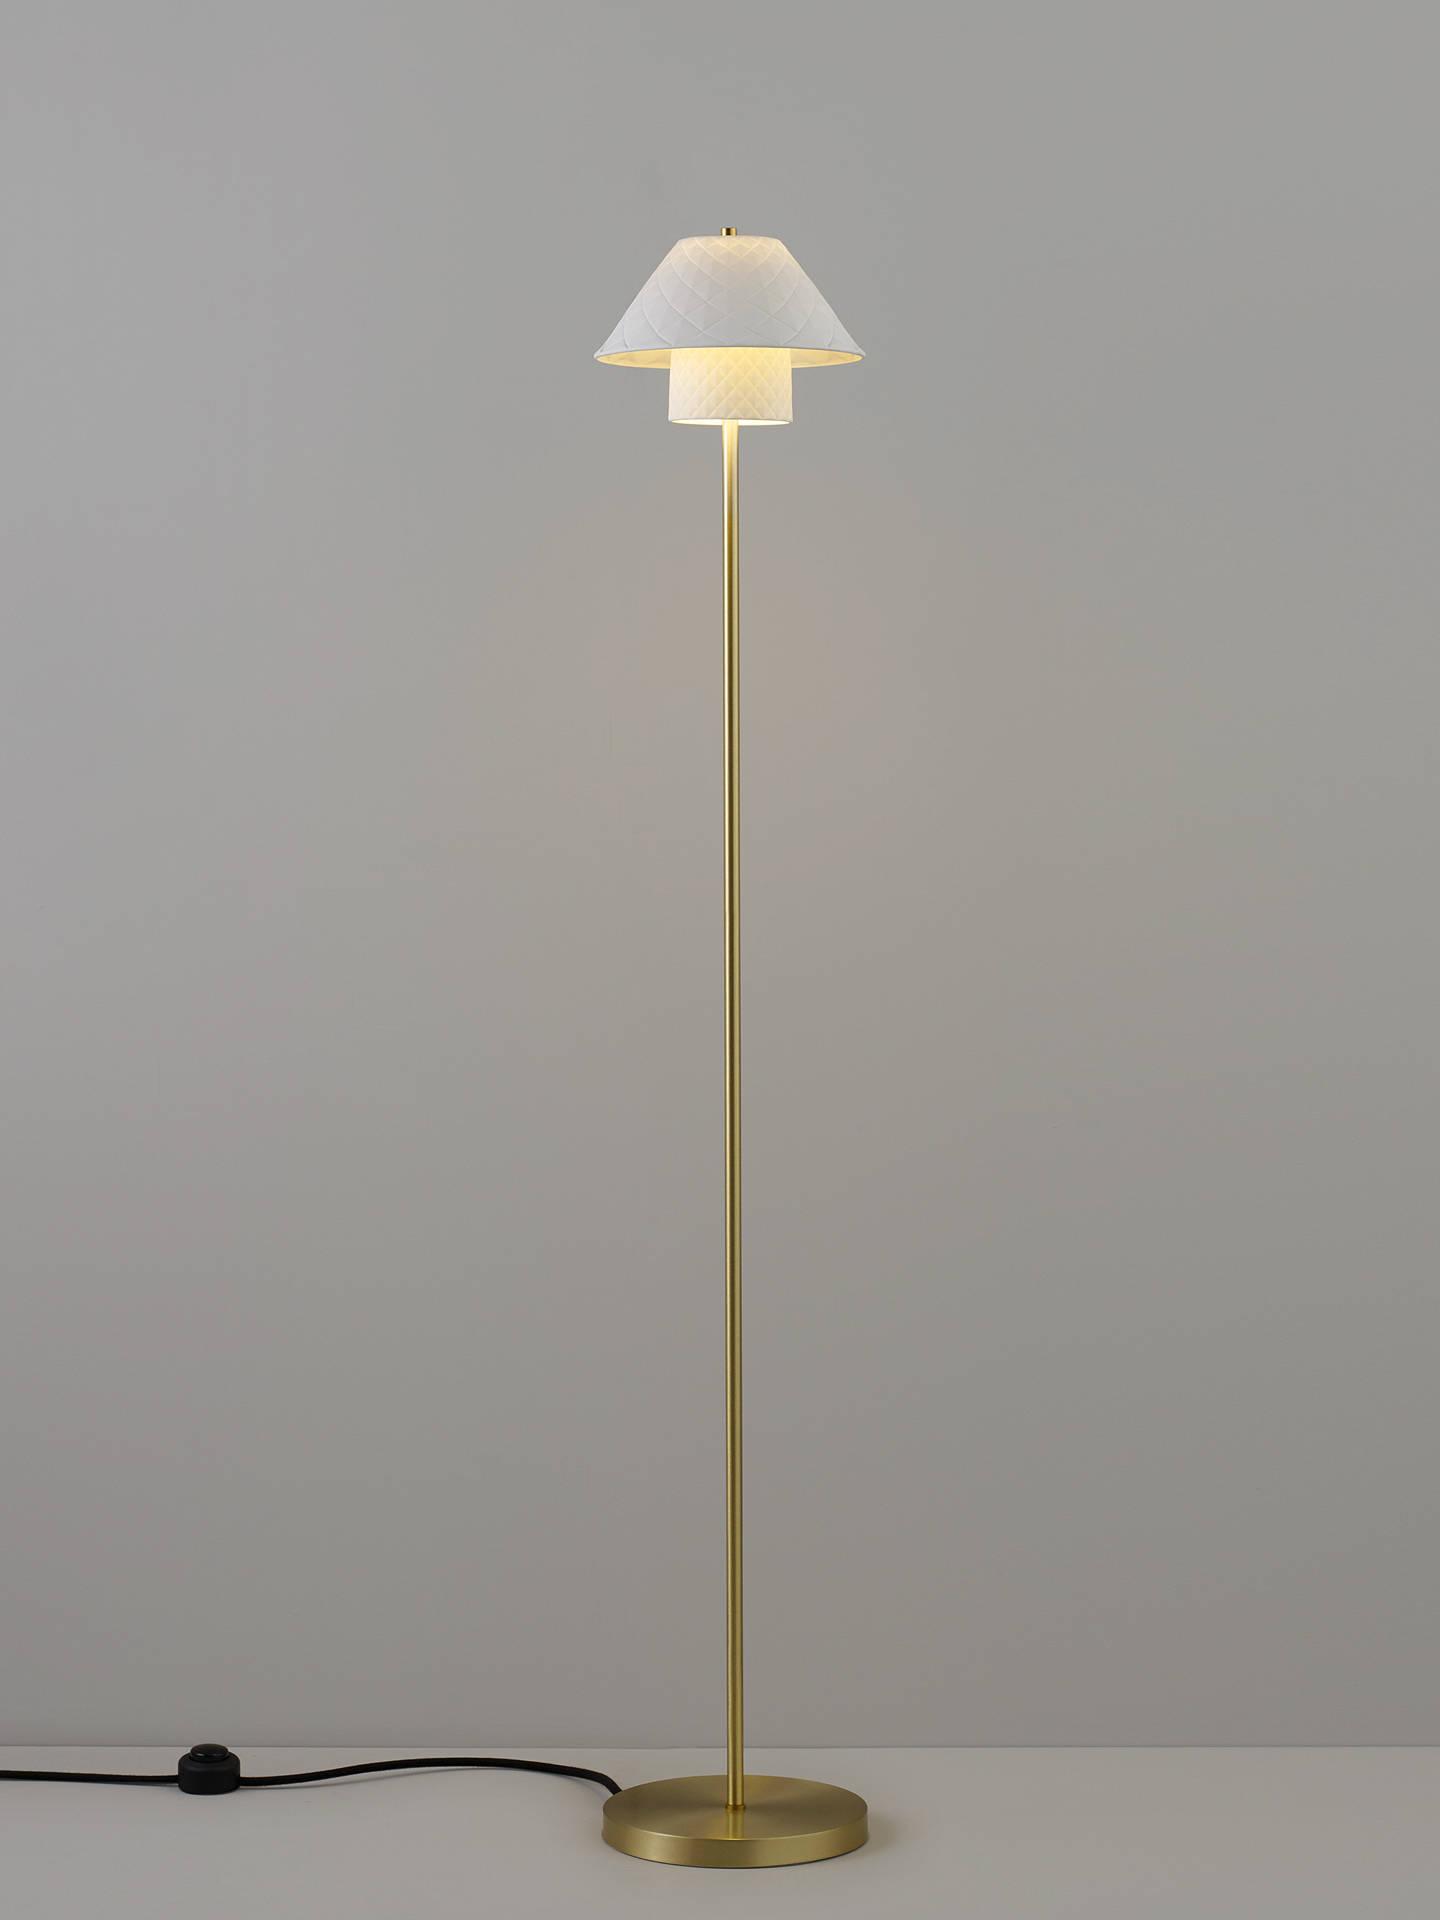 Original BTC Oxford Double Floor Lamp